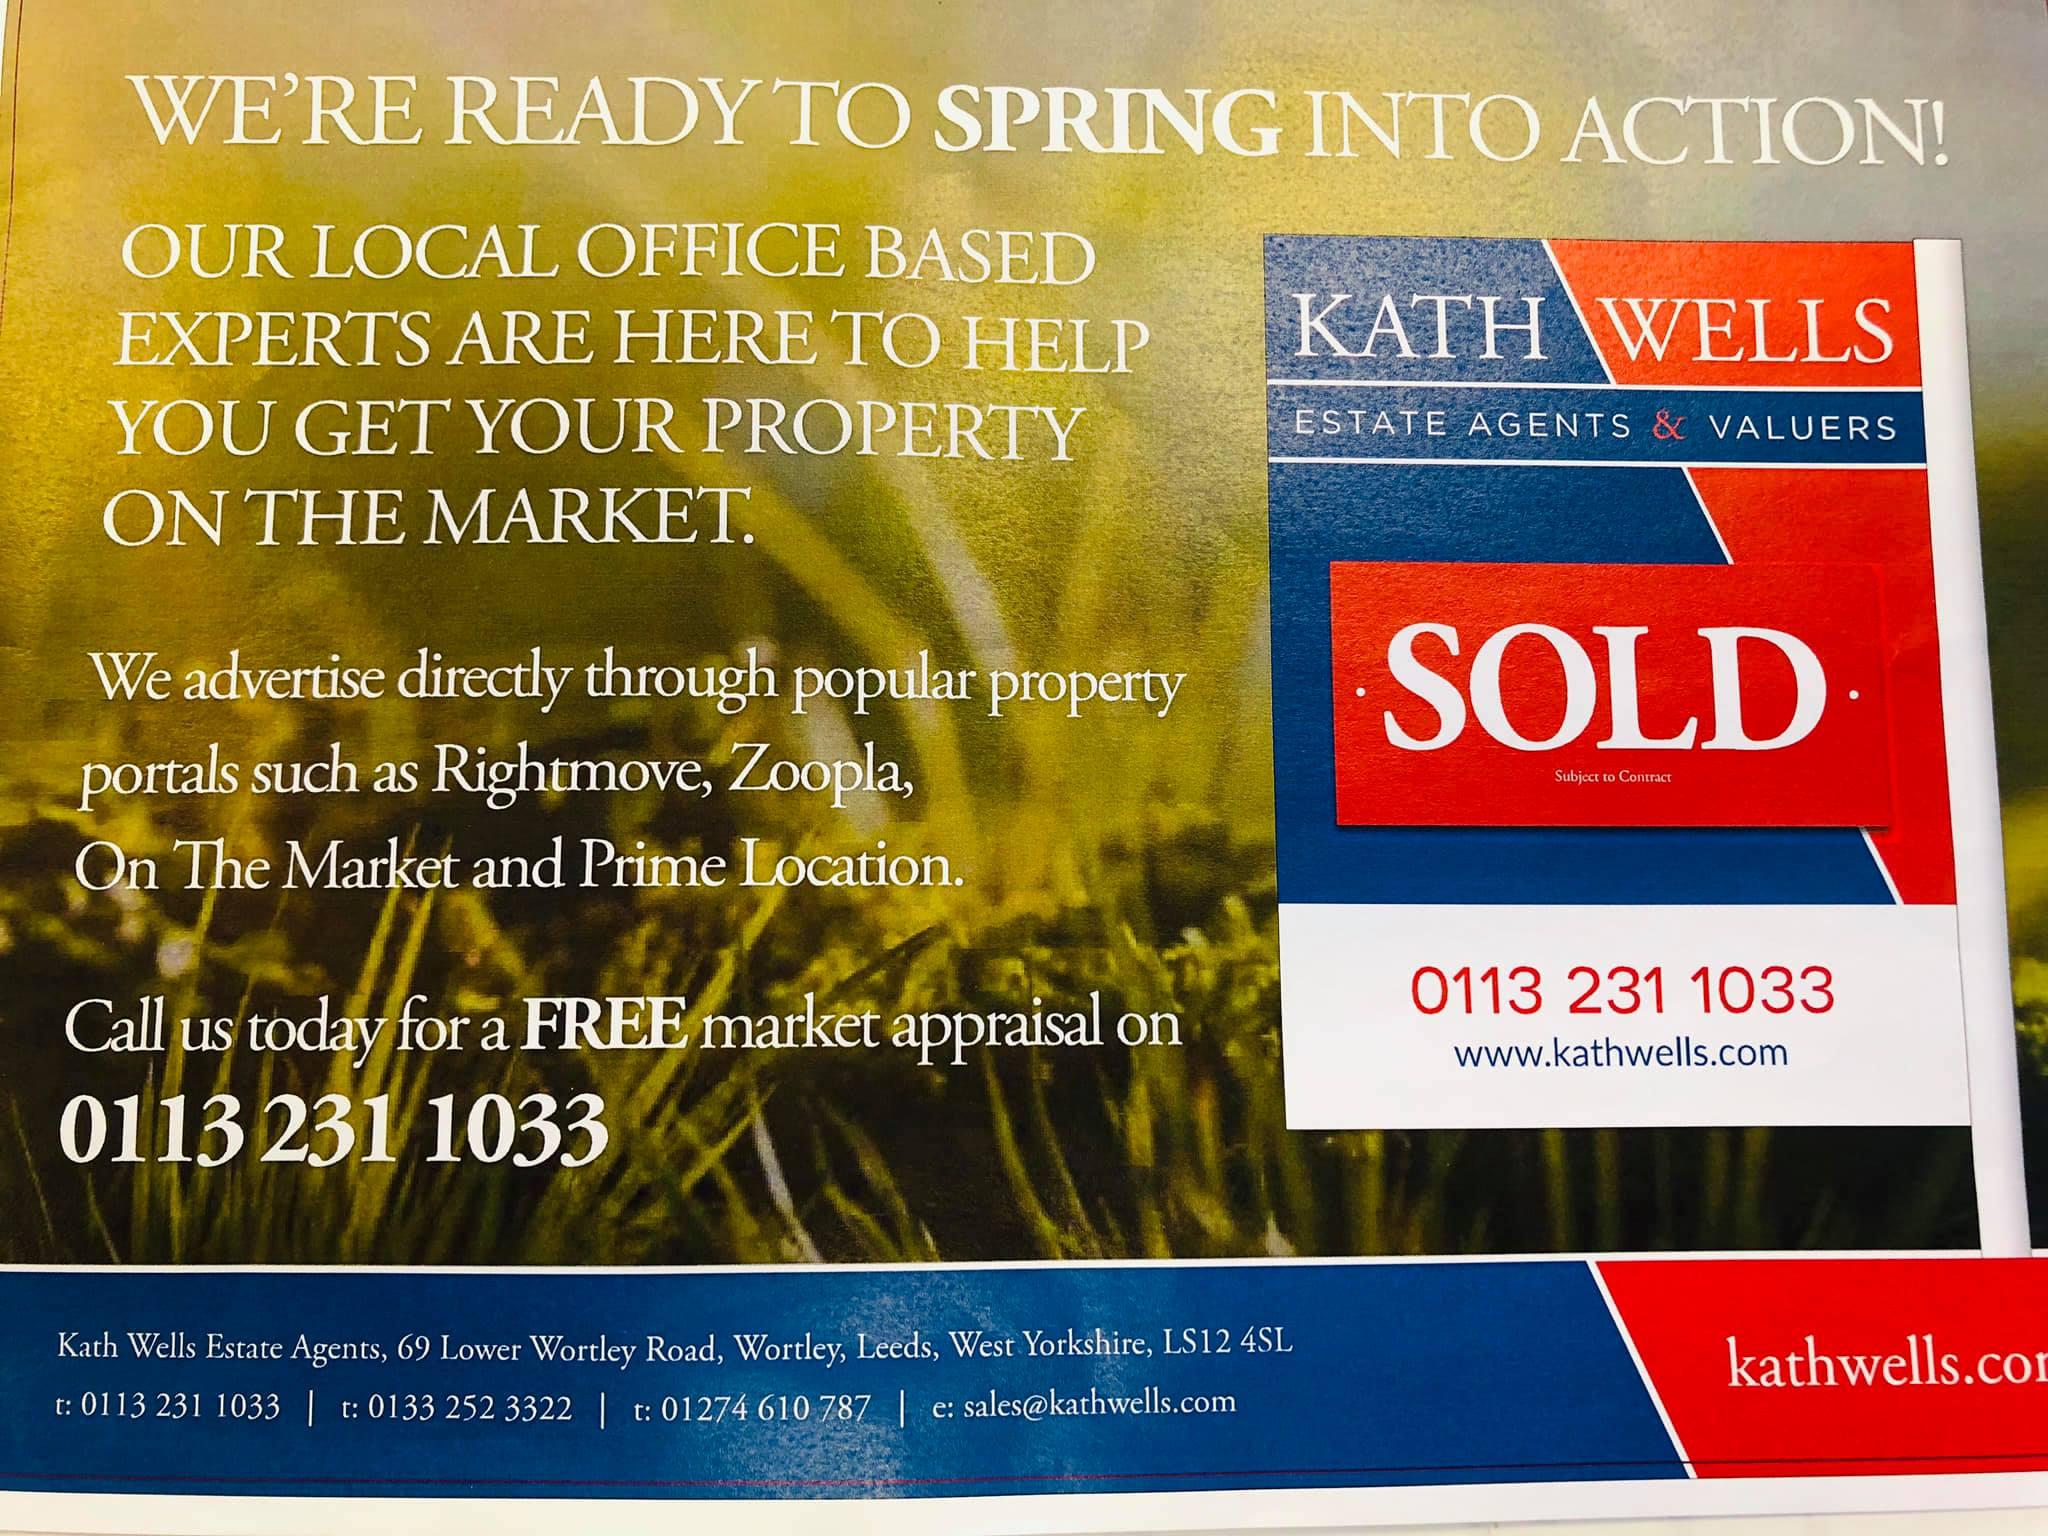 Kath Wells Estate Agents